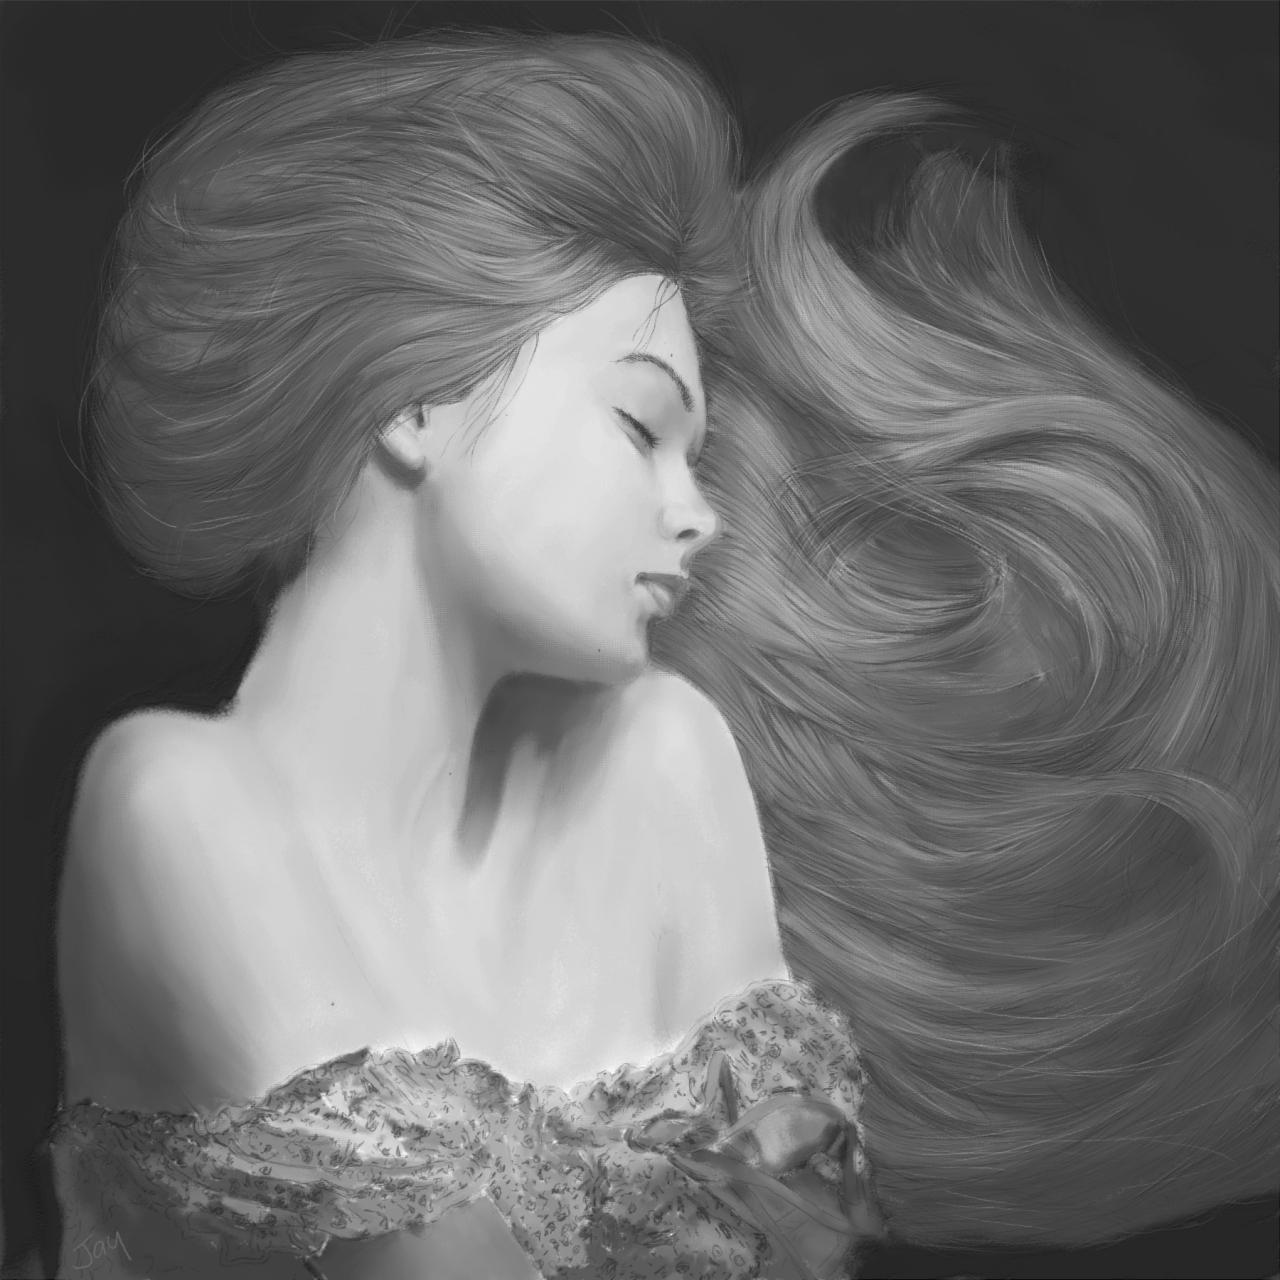 Hair - Pencil & Smudge